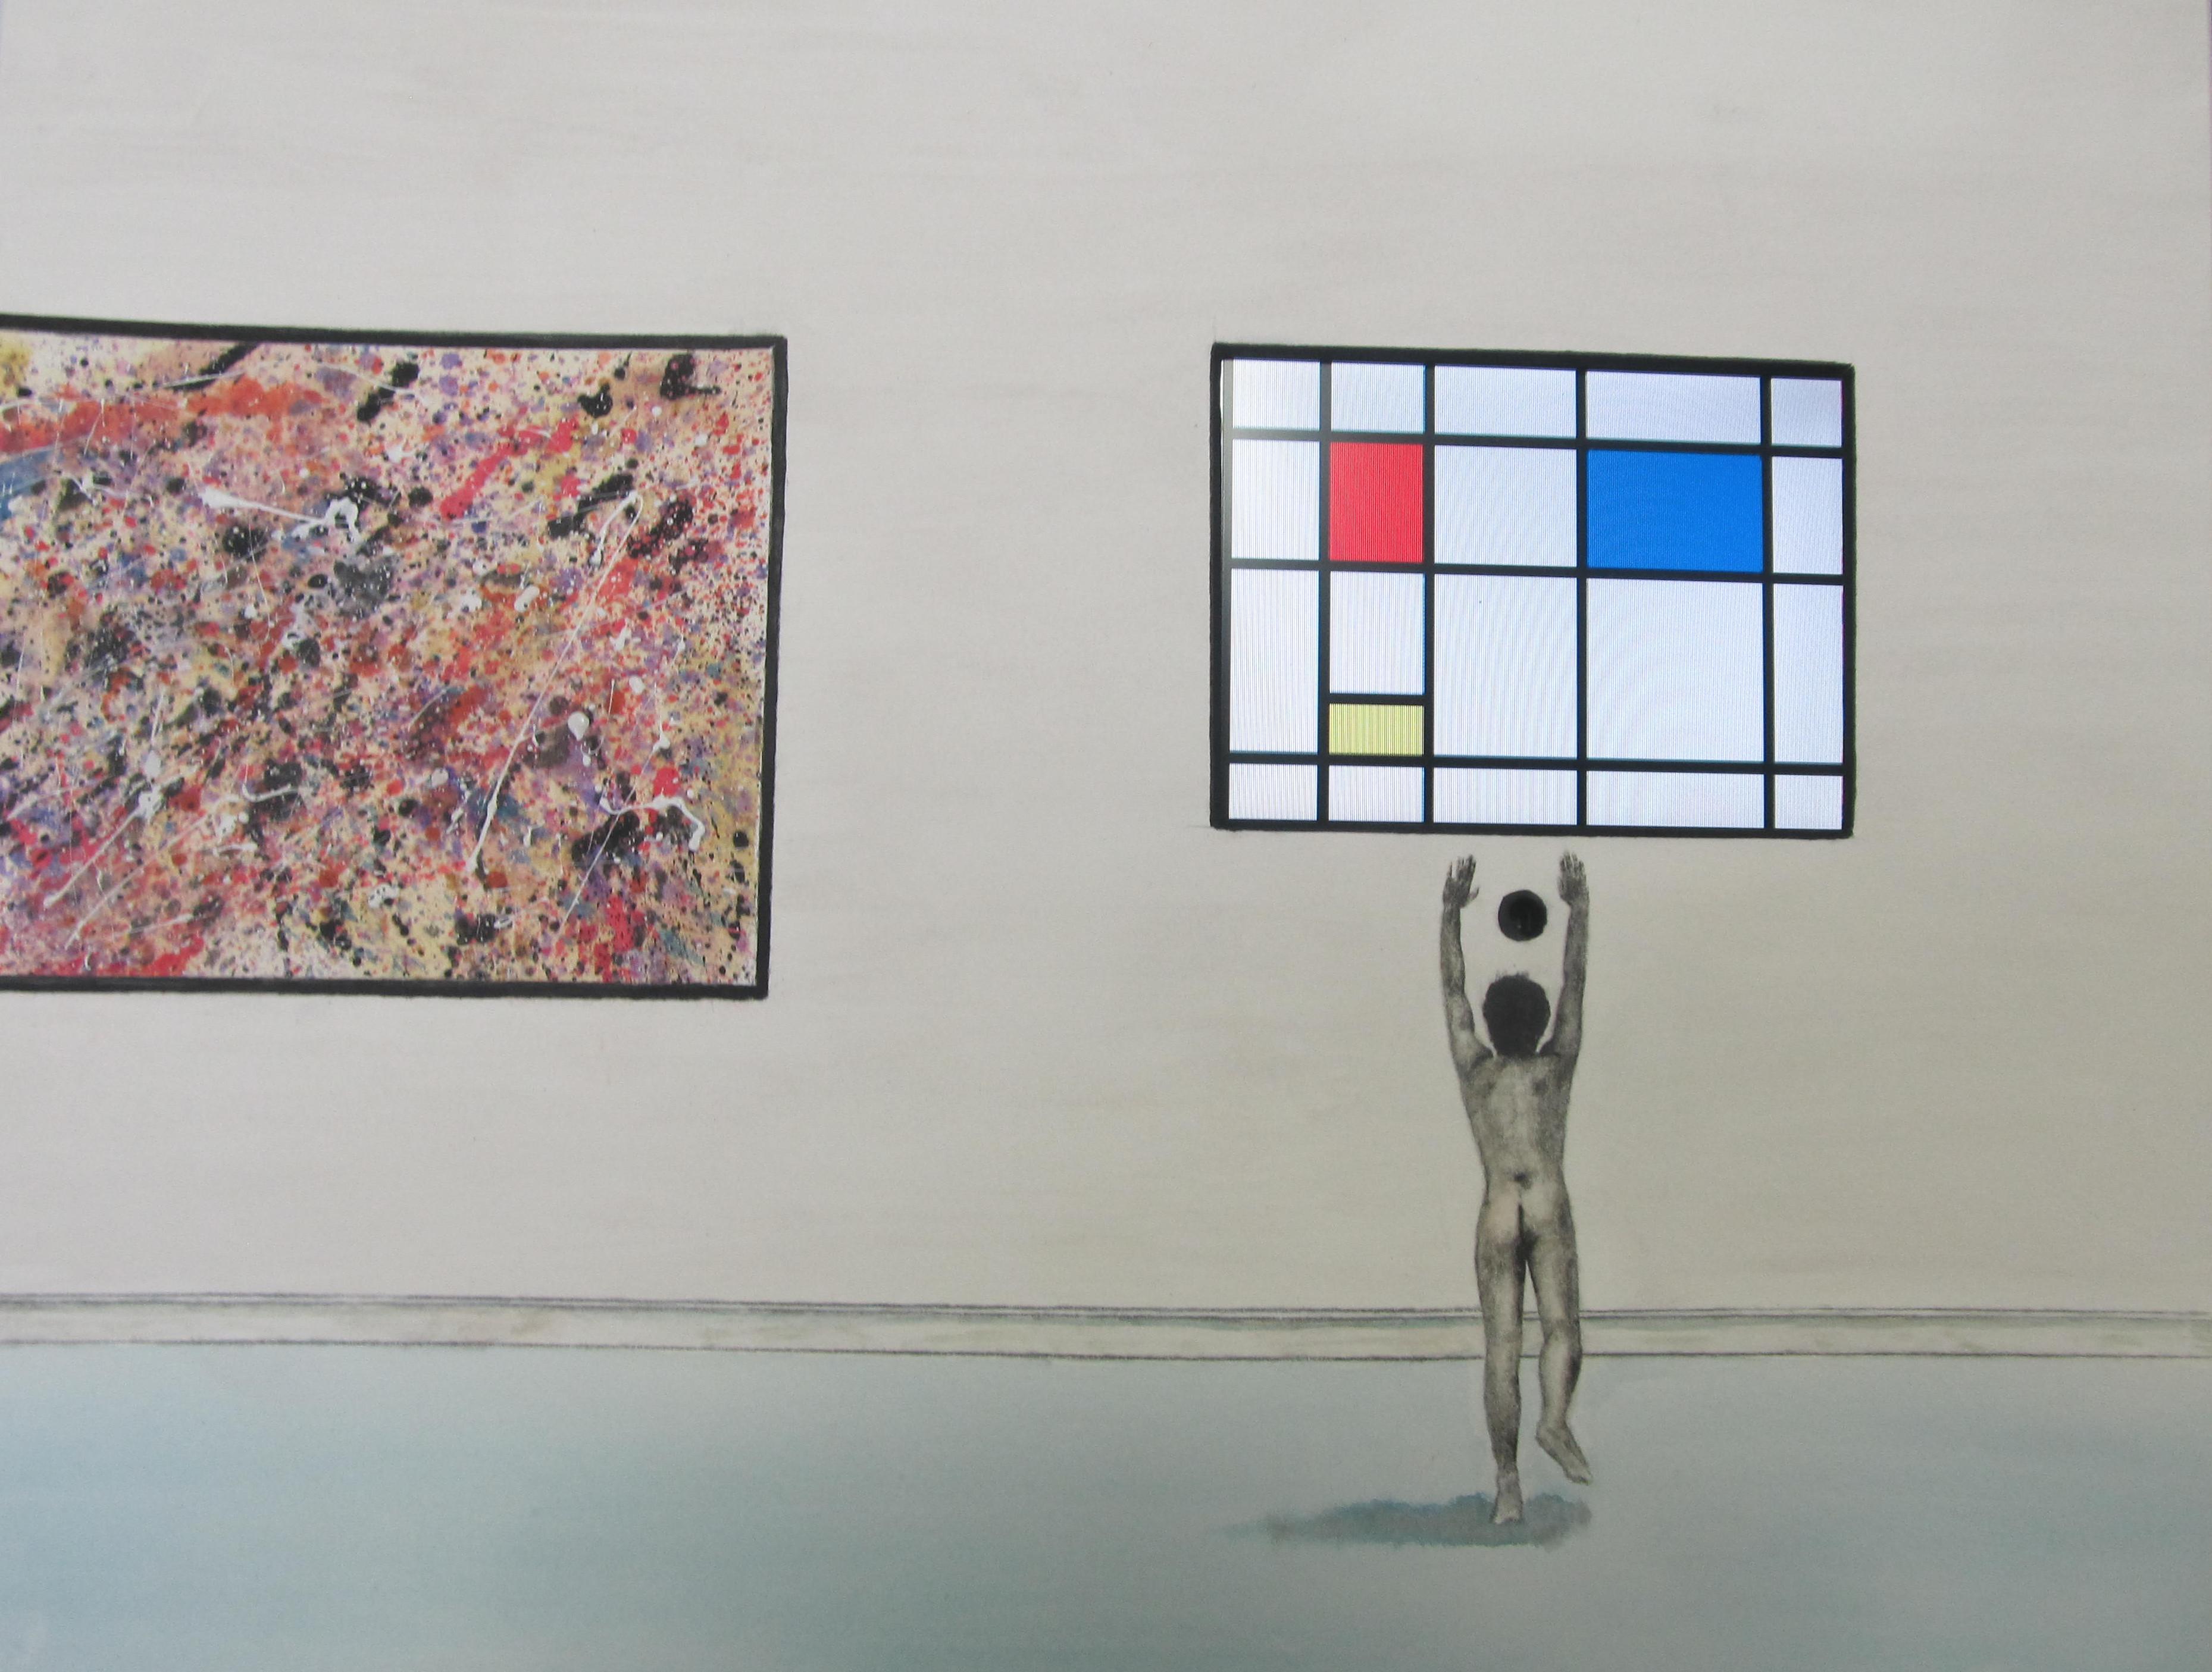 Artist Worshiping at the Altar of Modern Art